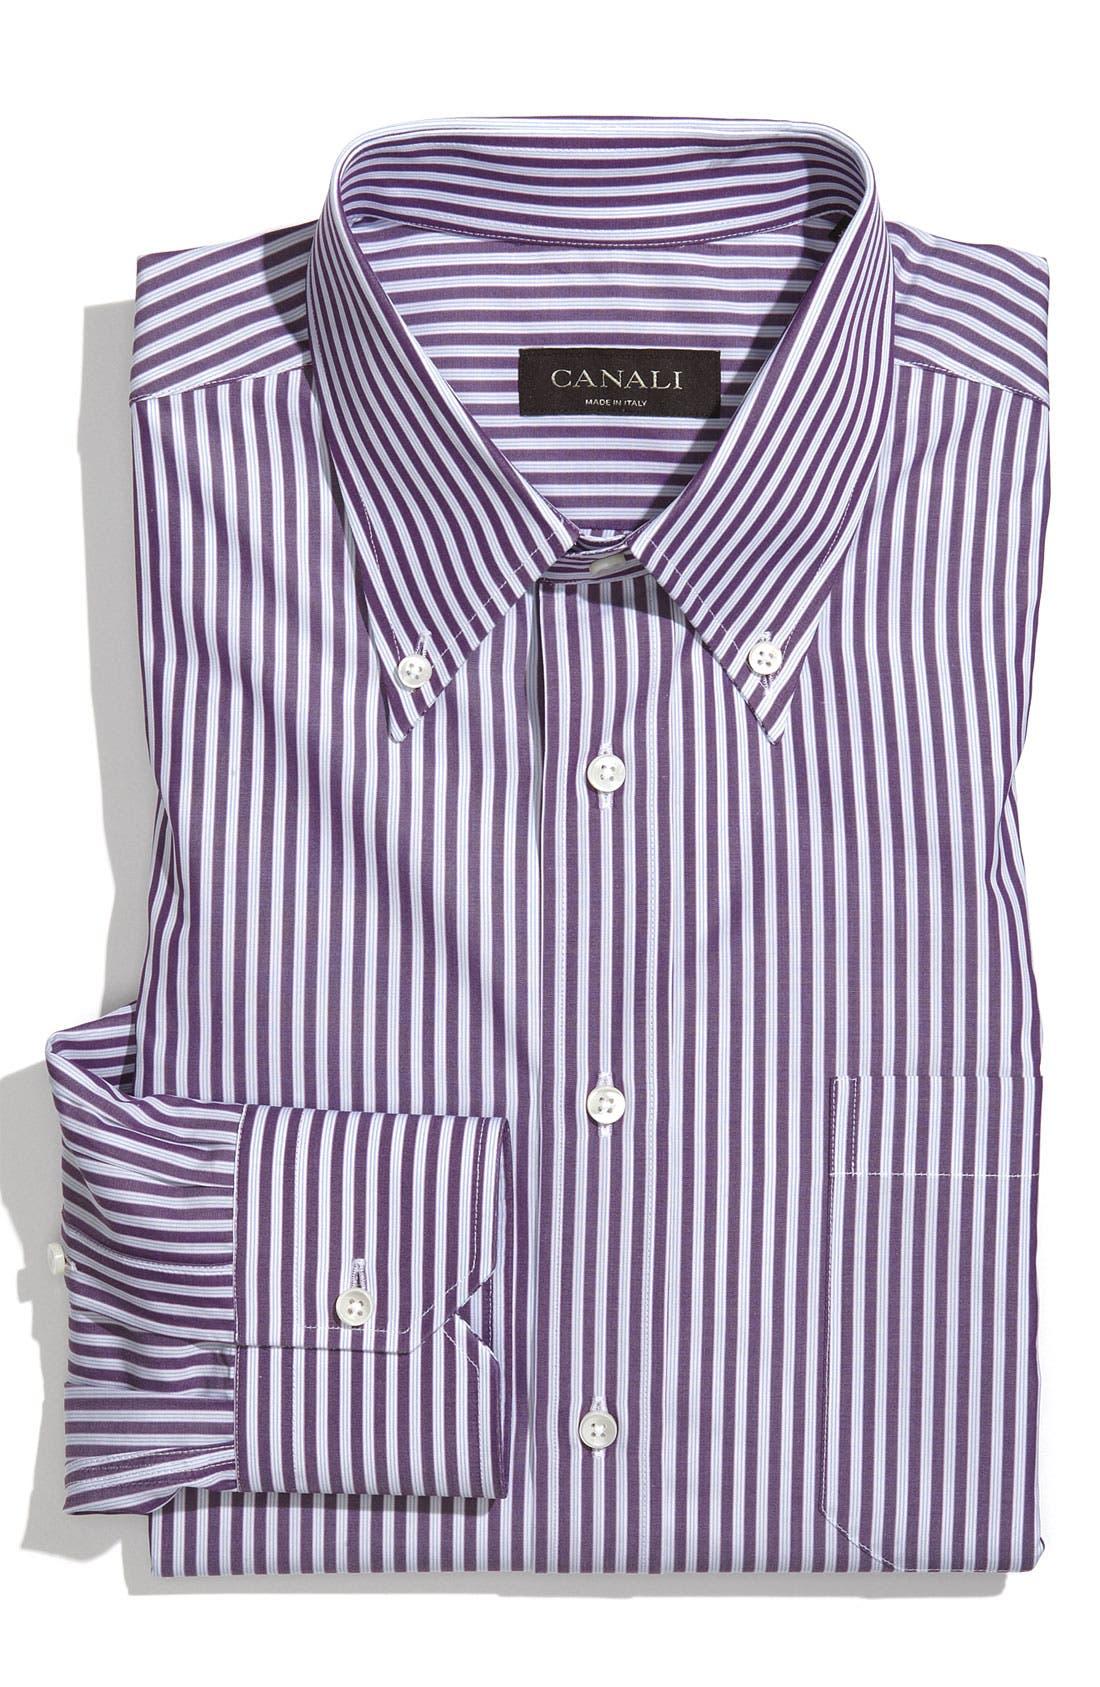 Alternate Image 1 Selected - Canali Regular Fit Dress Shirt